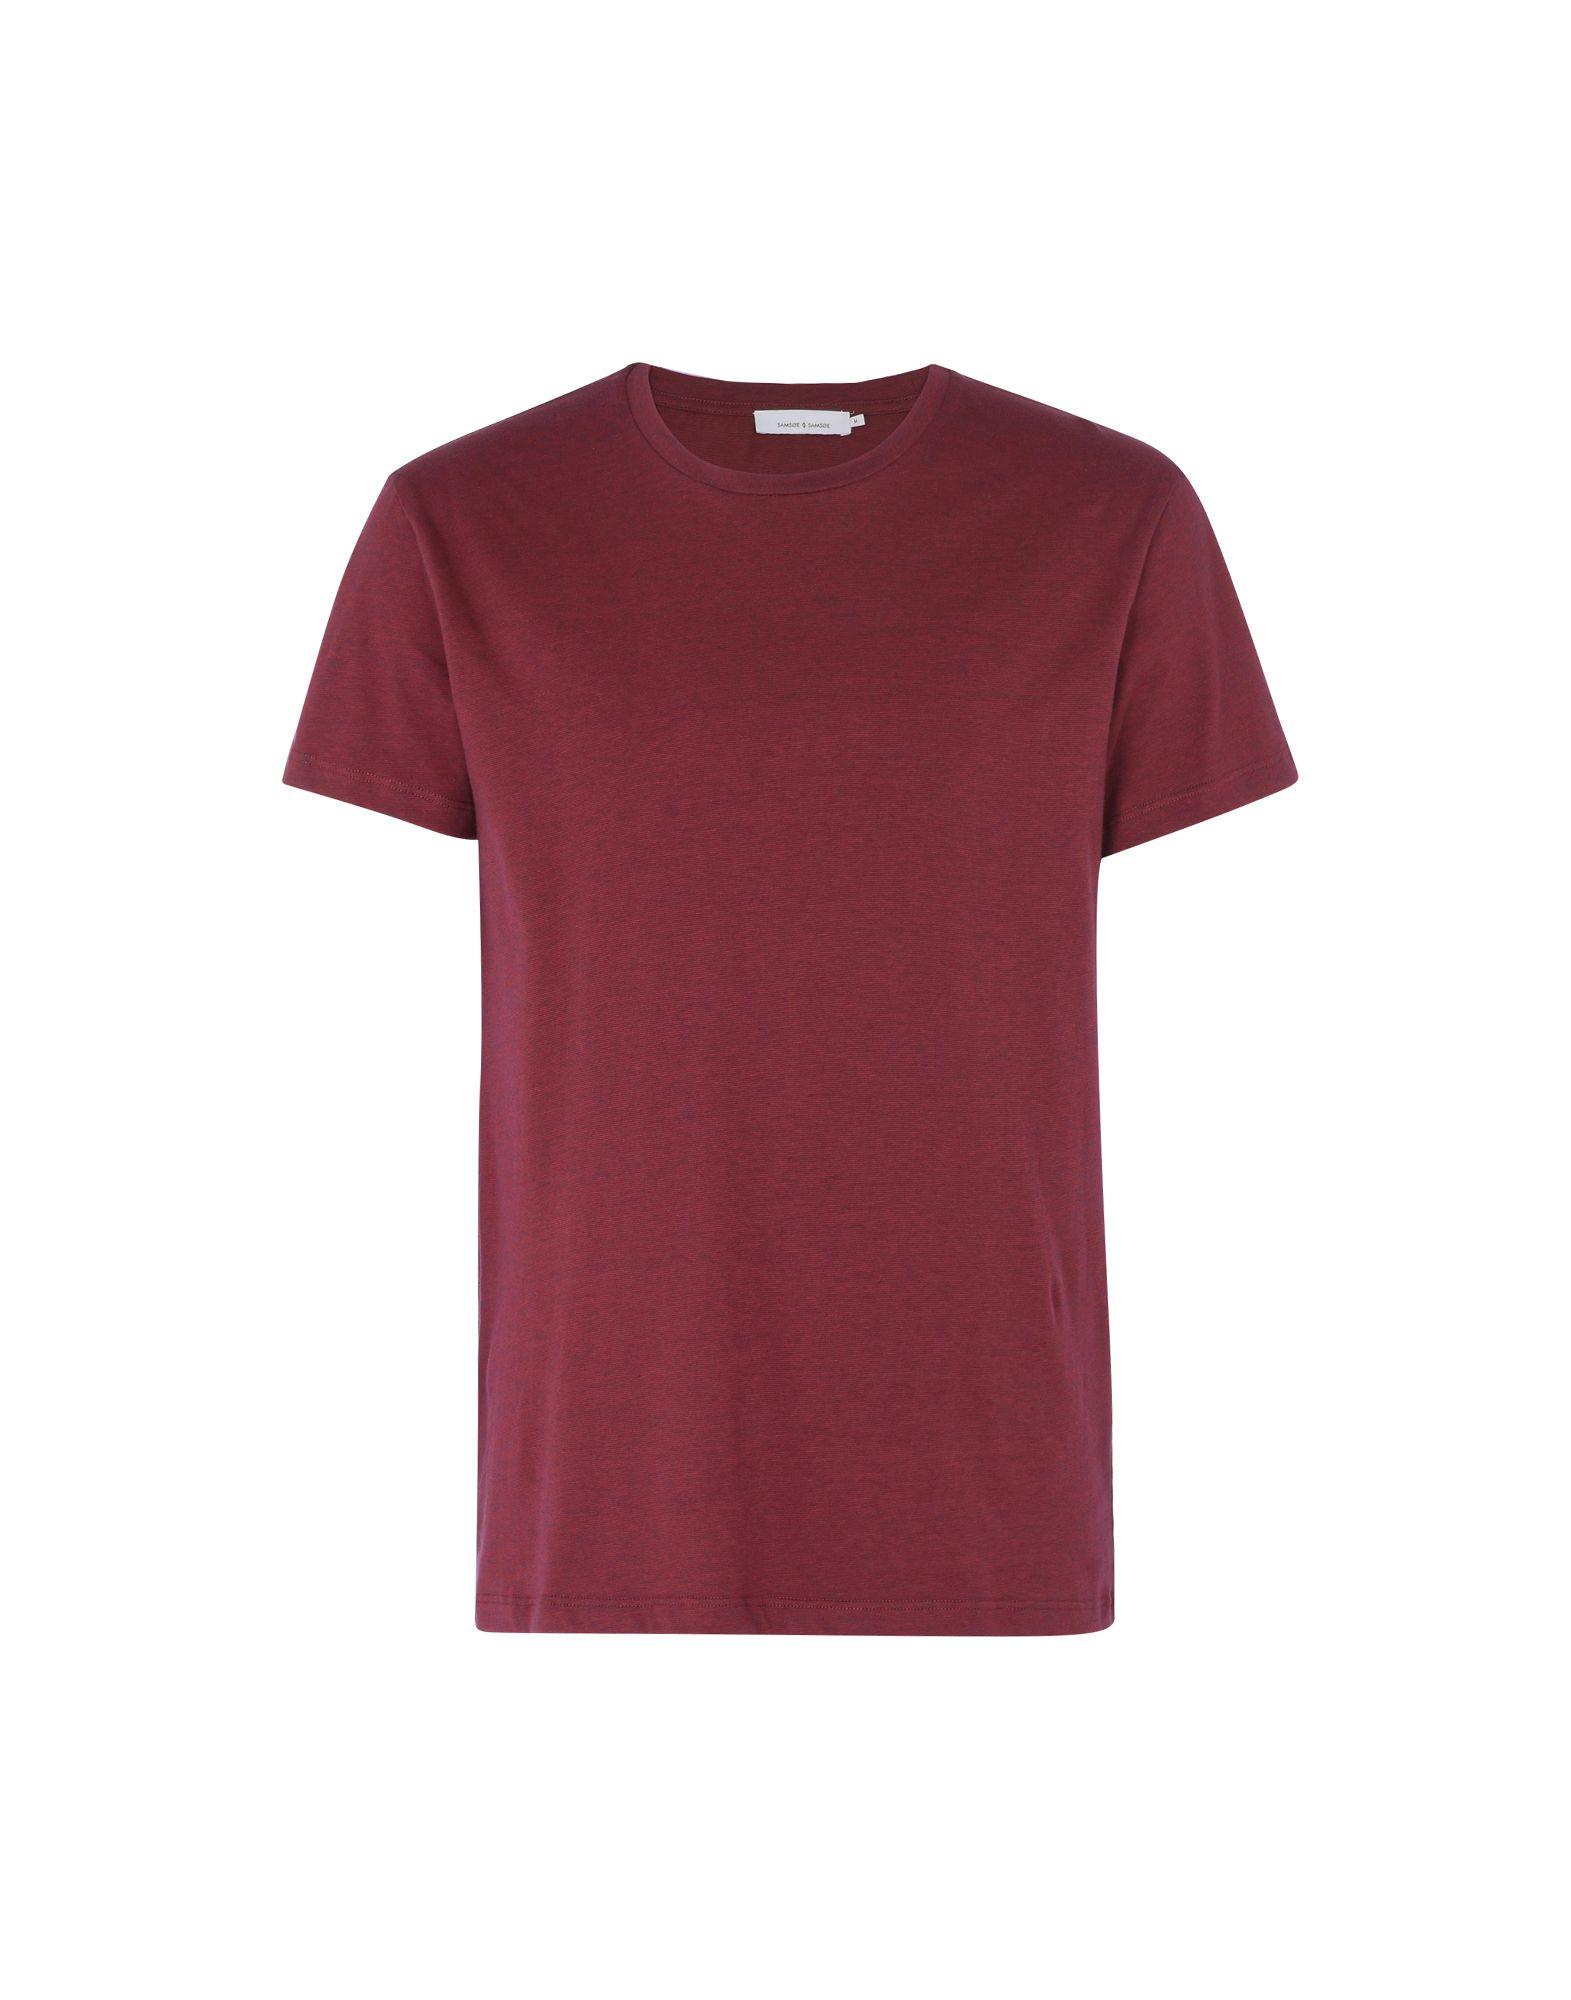 T-Shirt Samsøe Φ Samsøe Kronos Stripe - - uomo - 12198874BP  Factory Outlets